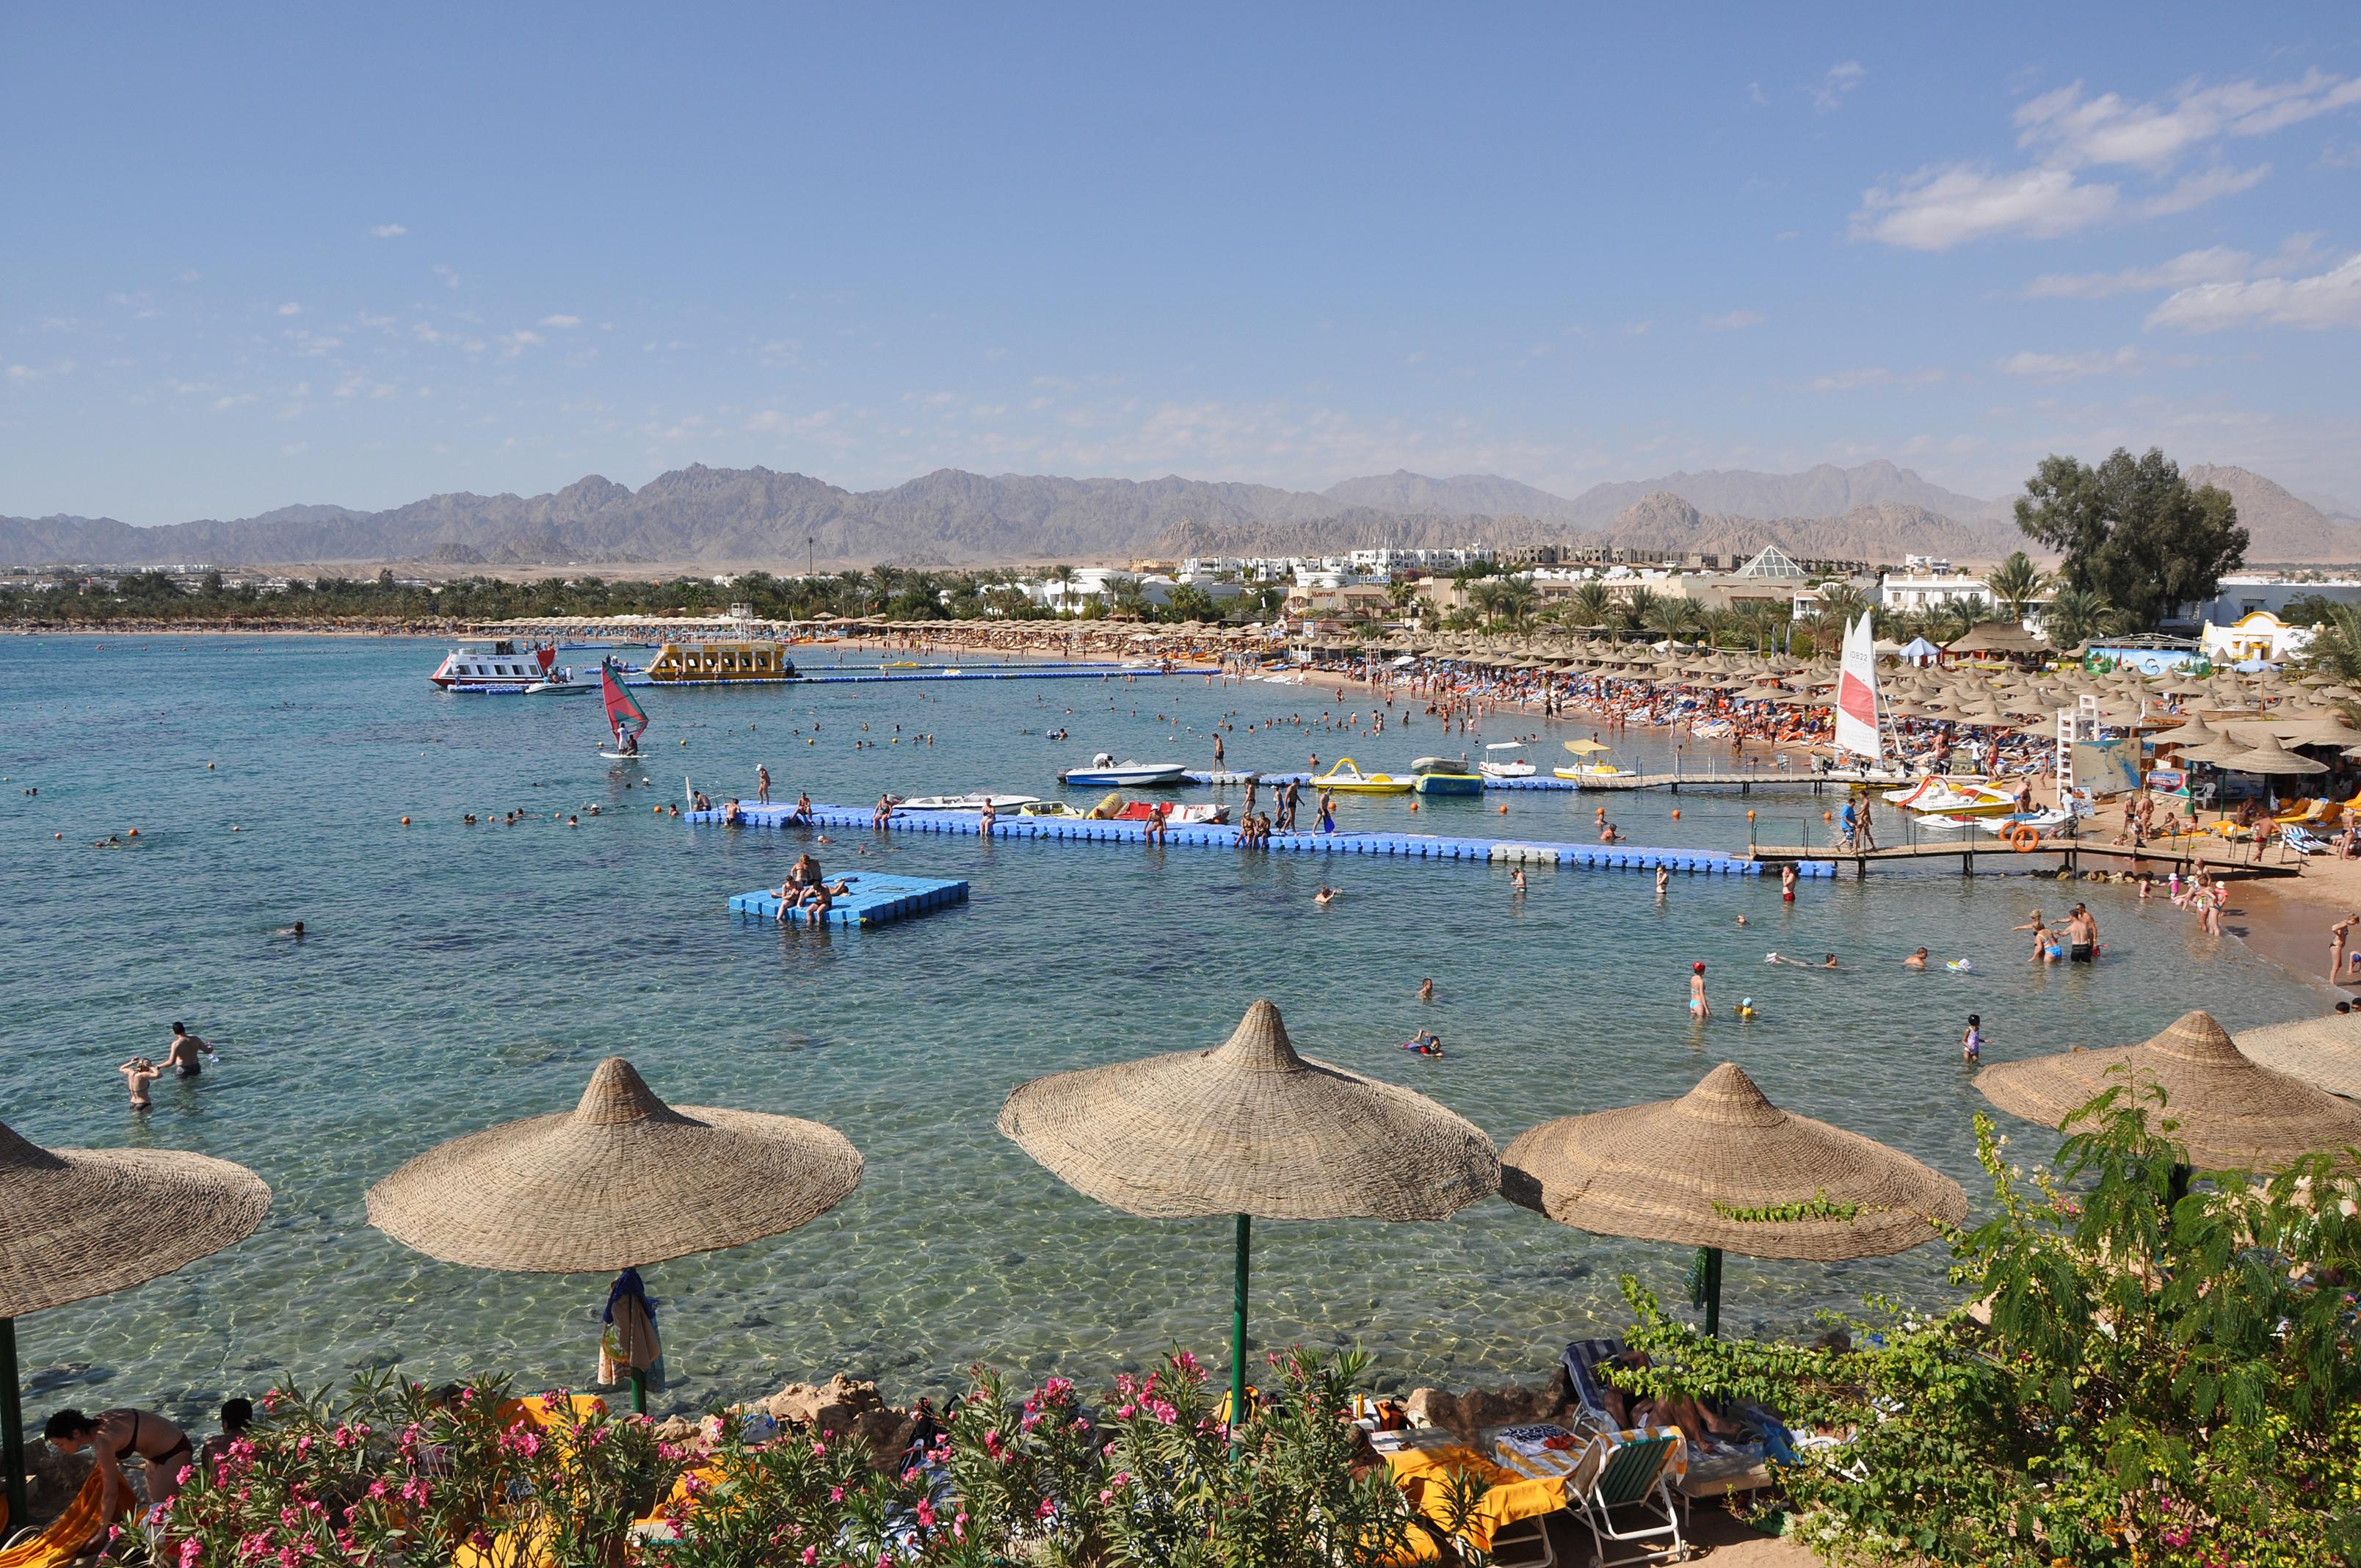 2010 Sharm El Sheikh Shark Attacks Wikipedia